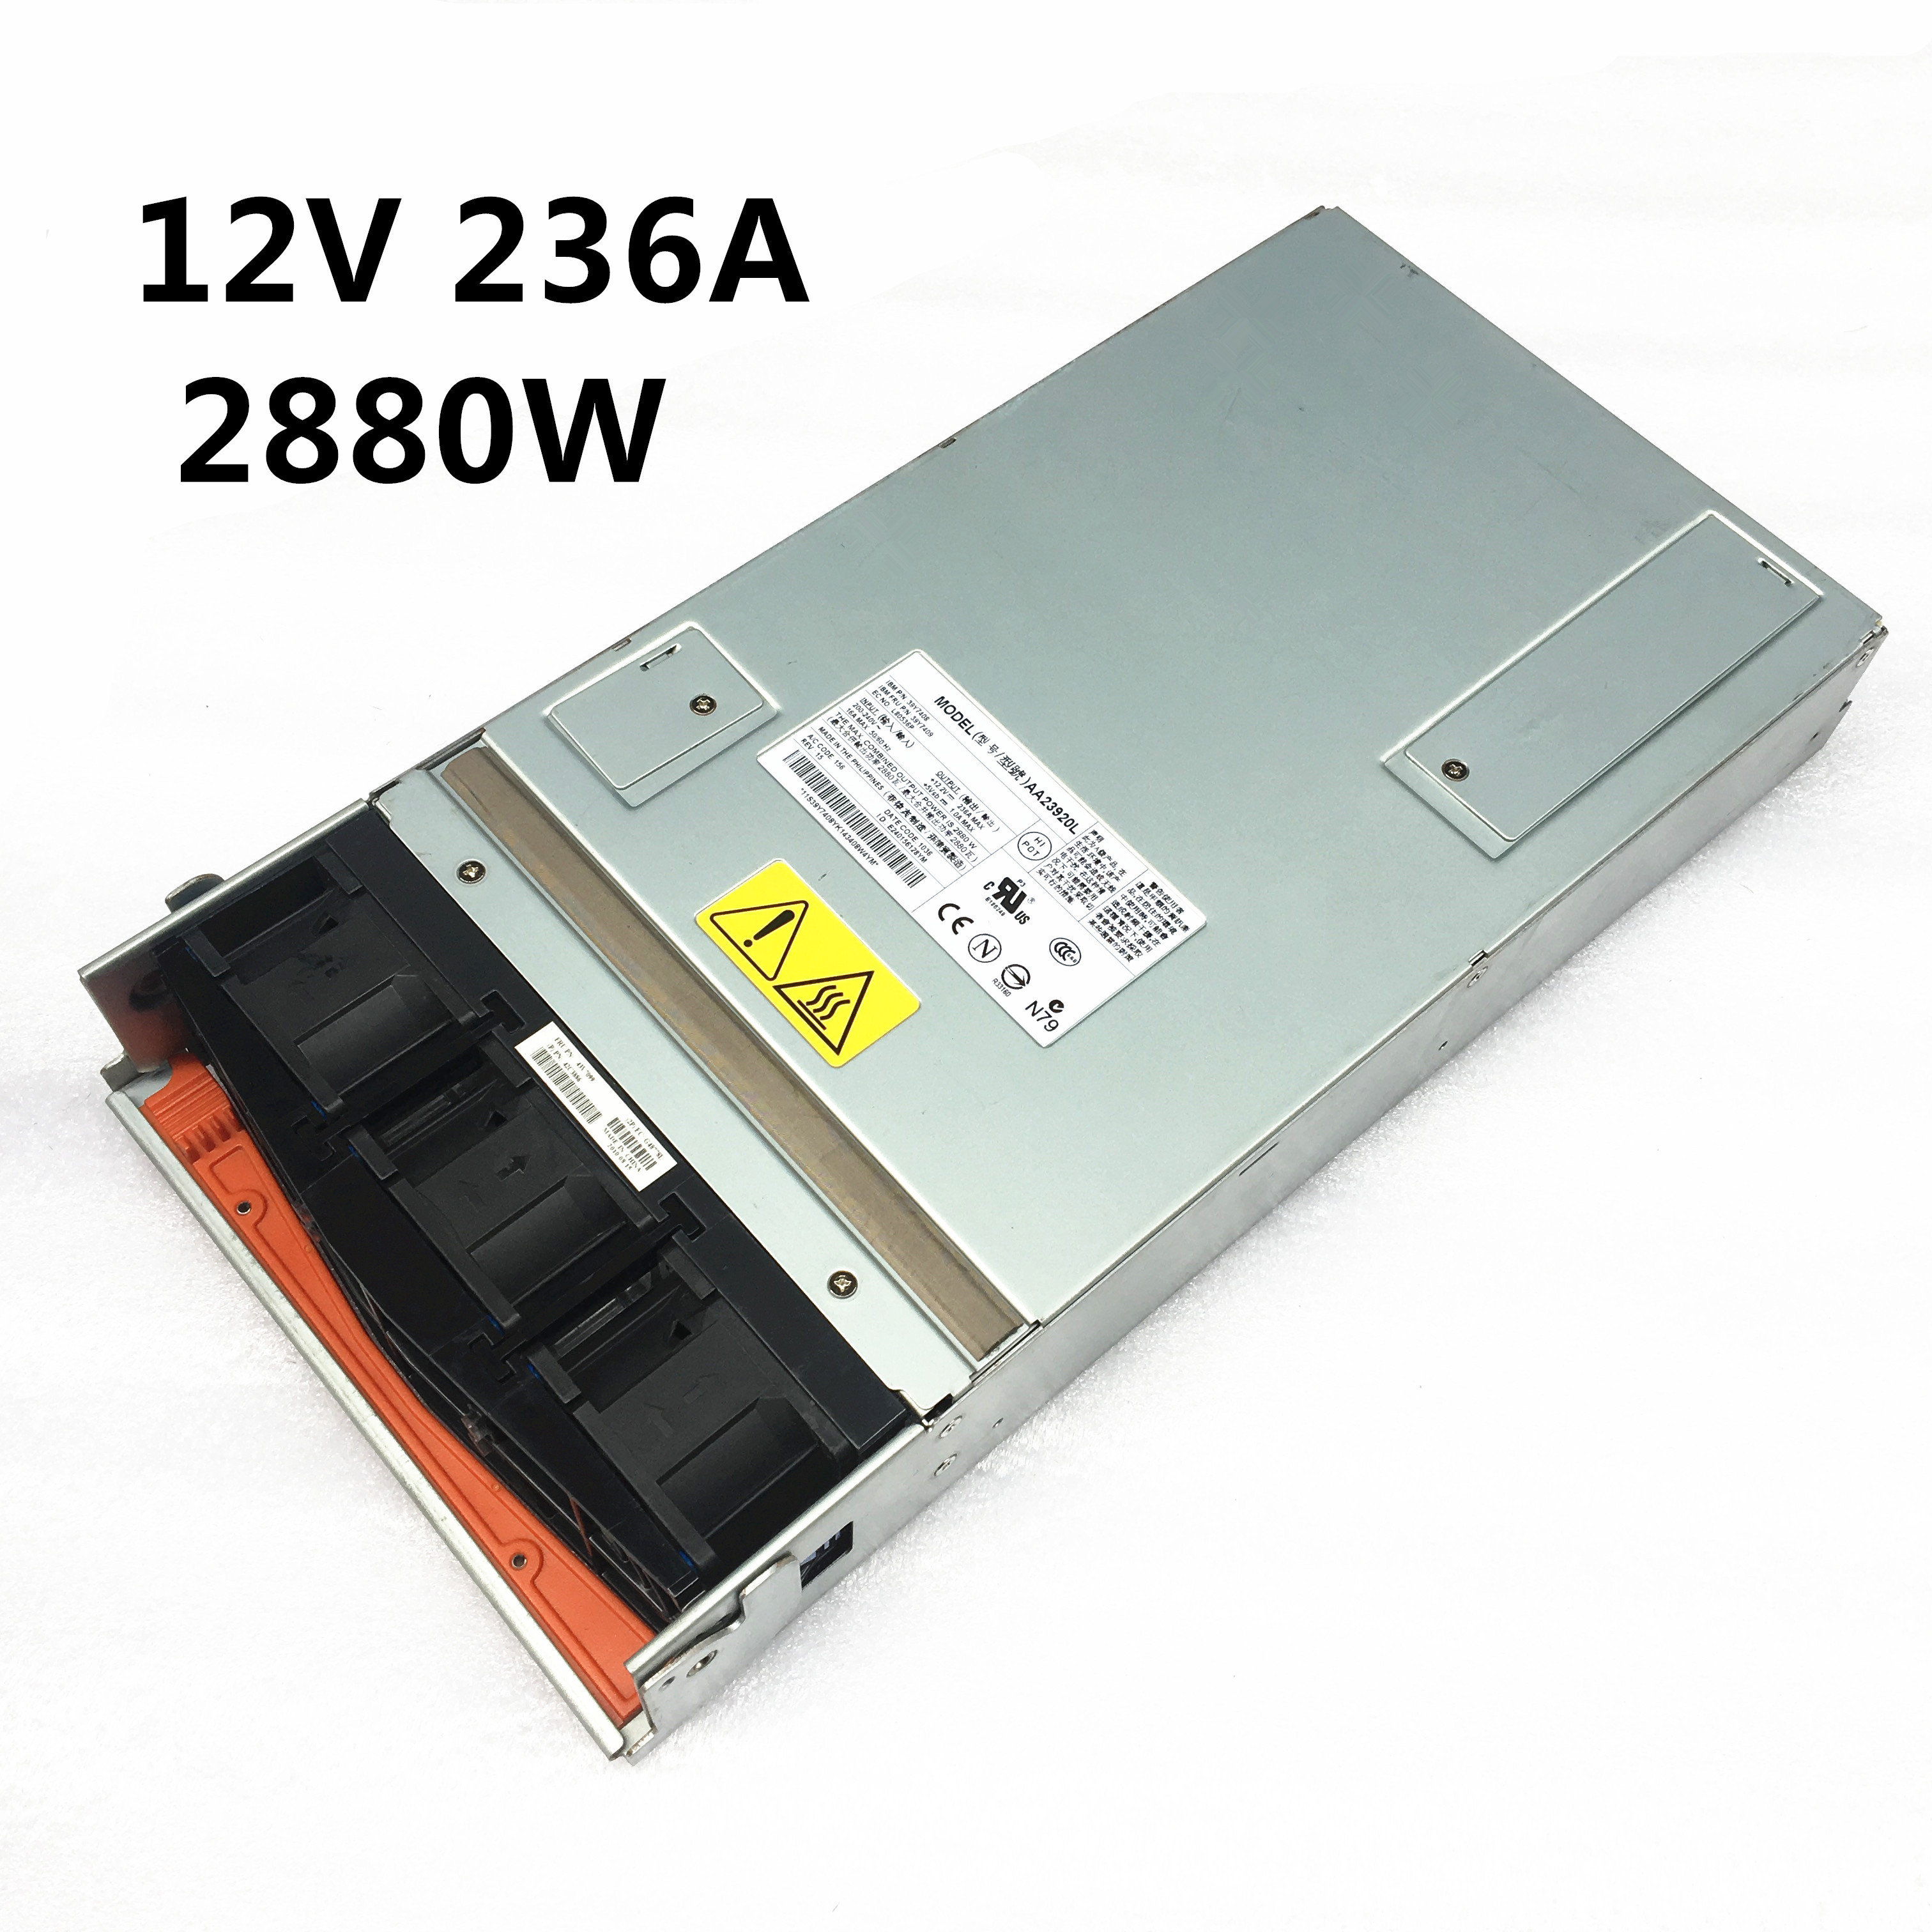 12V high Server power AA23920L 39Y7364 39Y7350 39Y7349 12V 236A 2880W Switching power supply 100 Strict